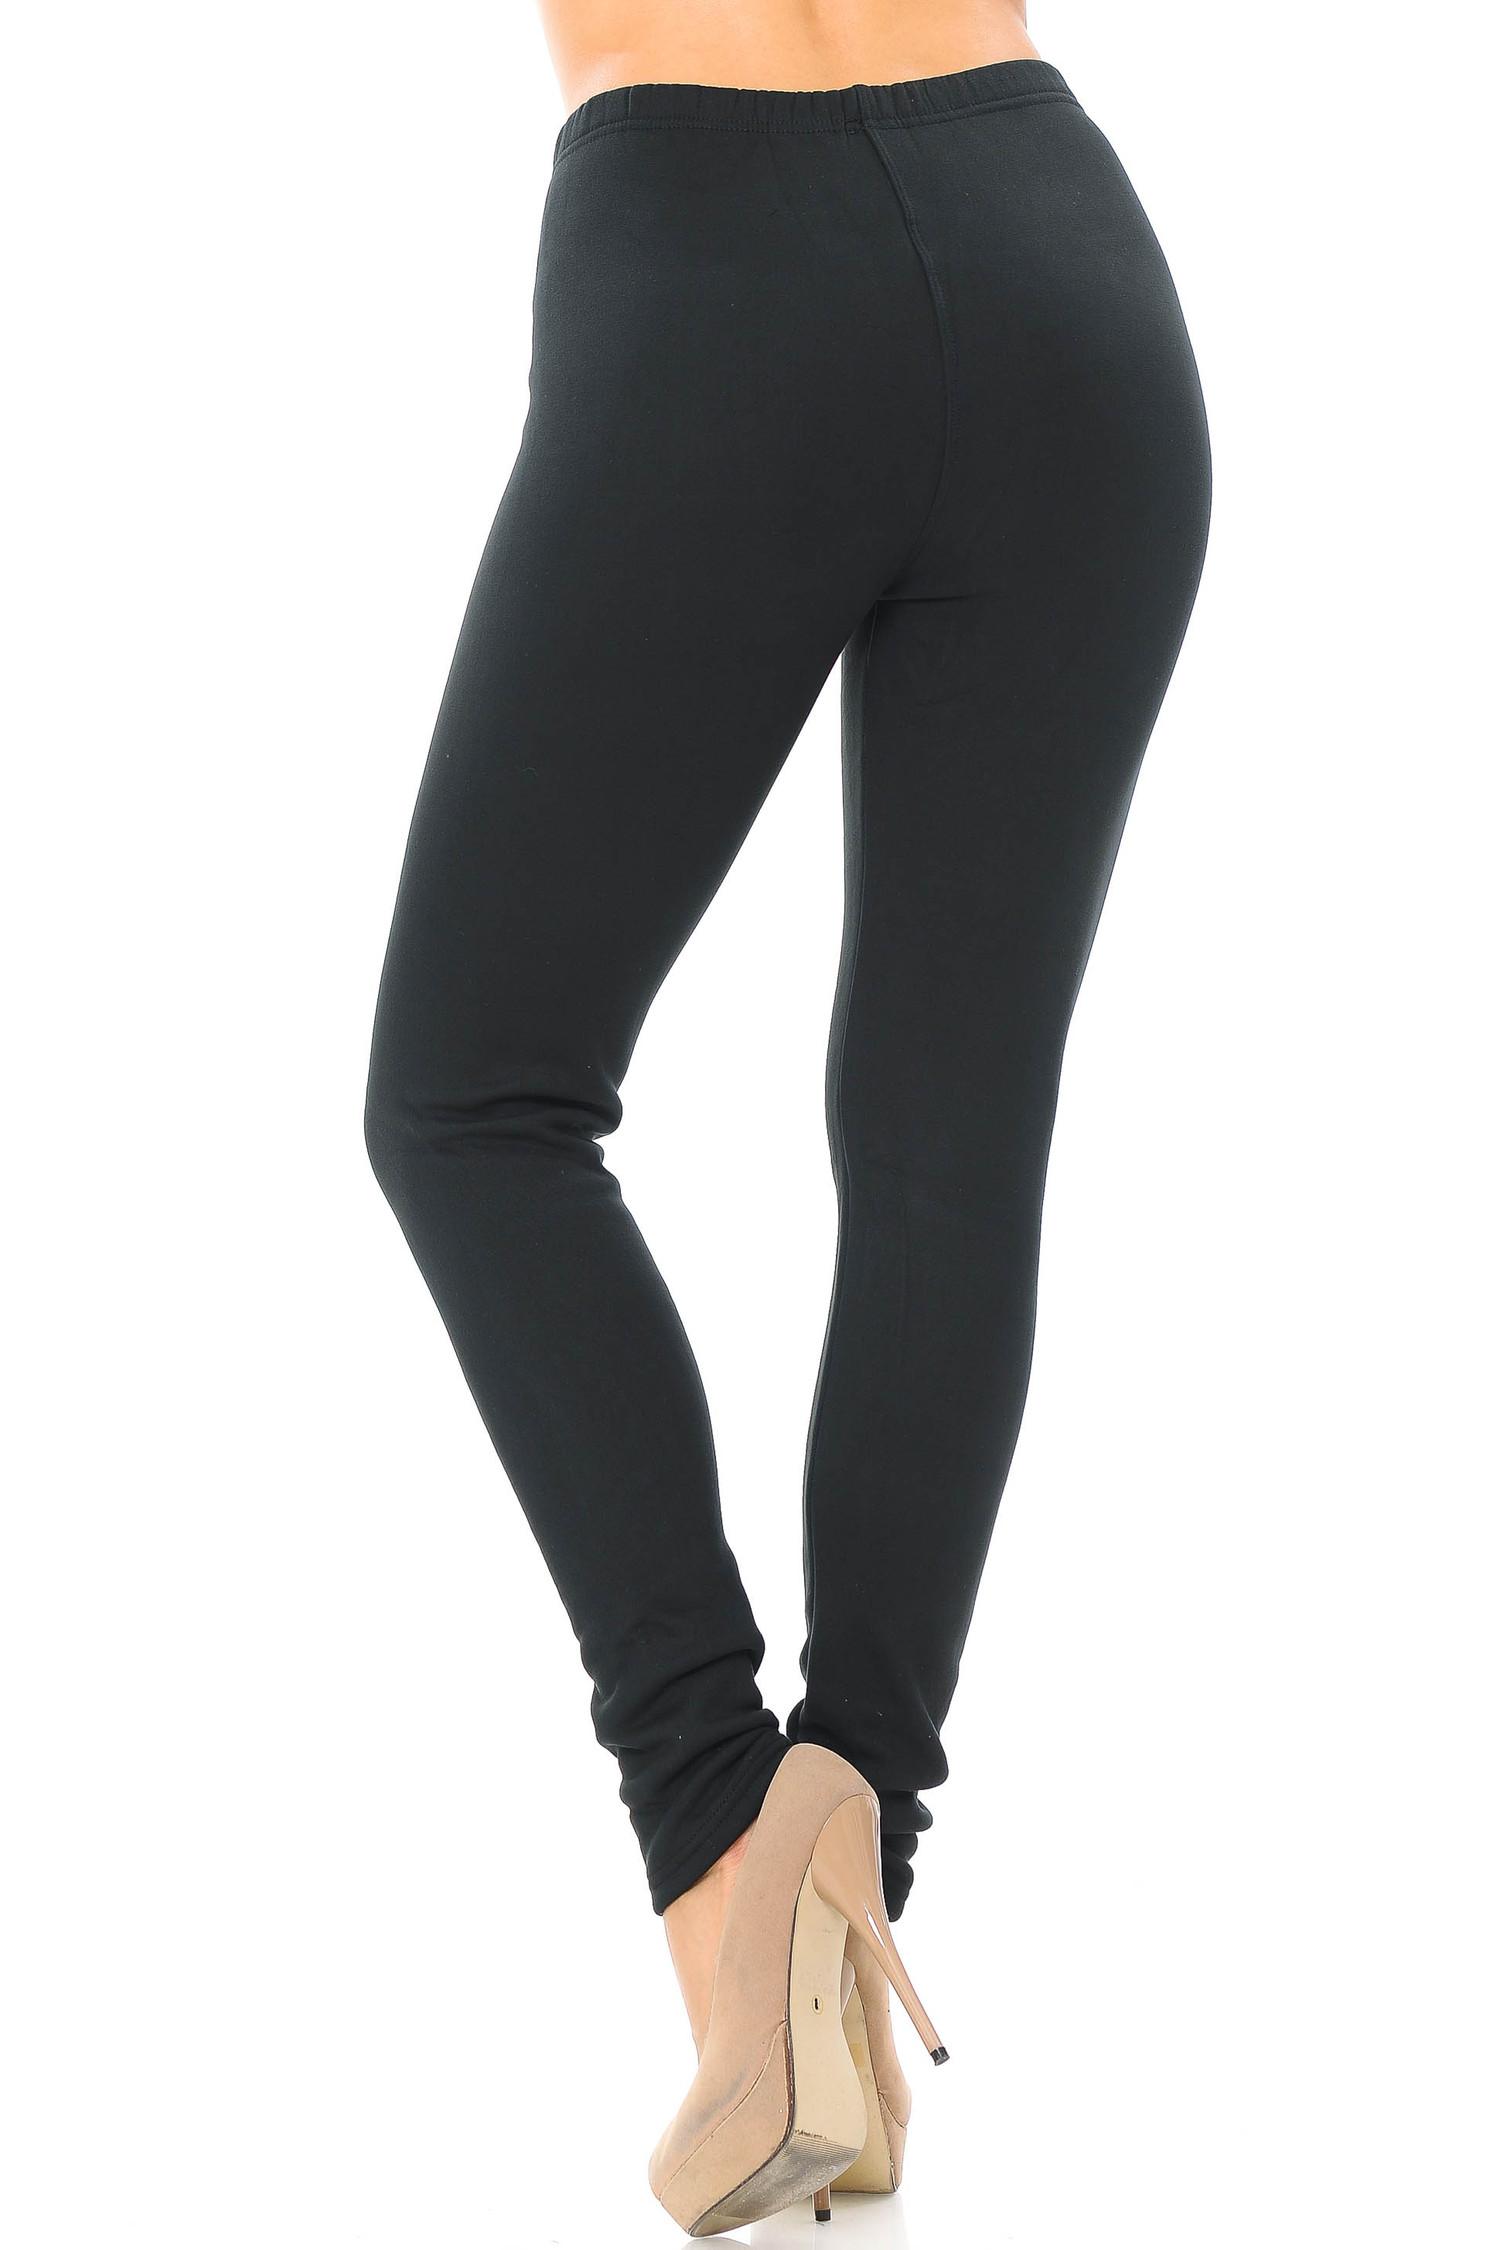 Back side view of Creamy Soft Fleece Lined Plus Size Leggings - USA Fashion™